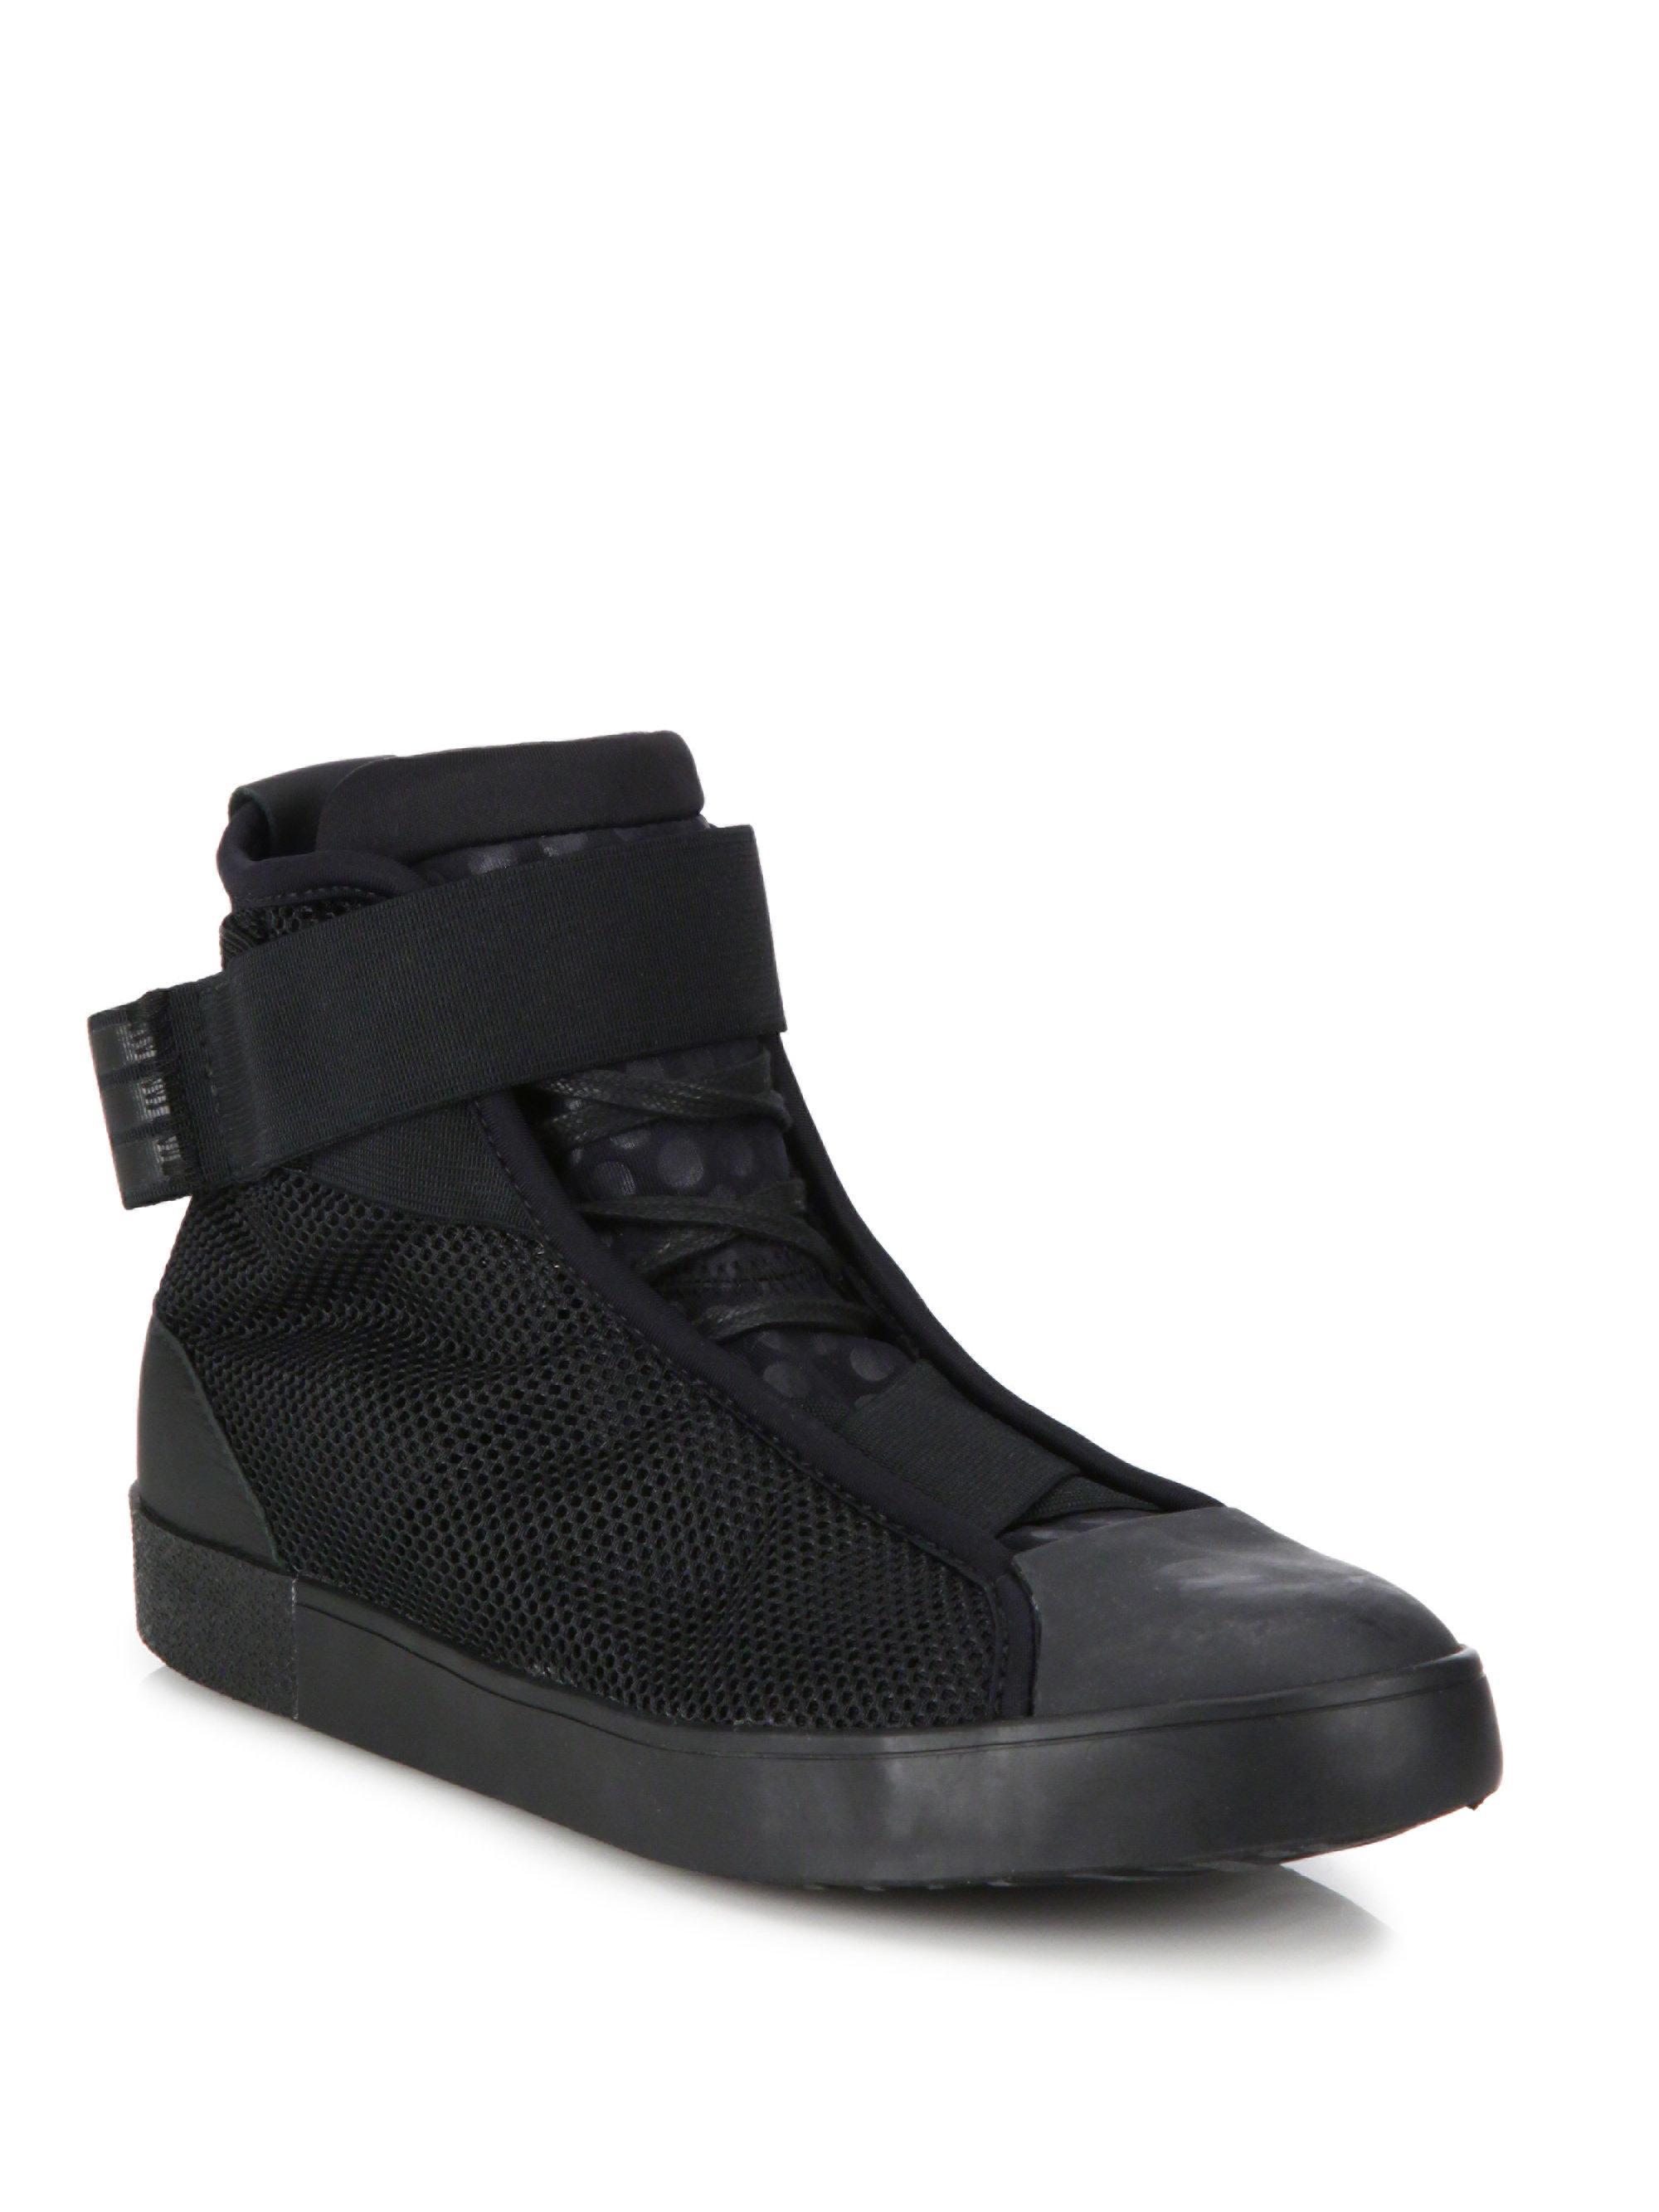 8d04e3c8242c6 Lyst - Y-3 Loop Court High-top Sneakers in Black for Men